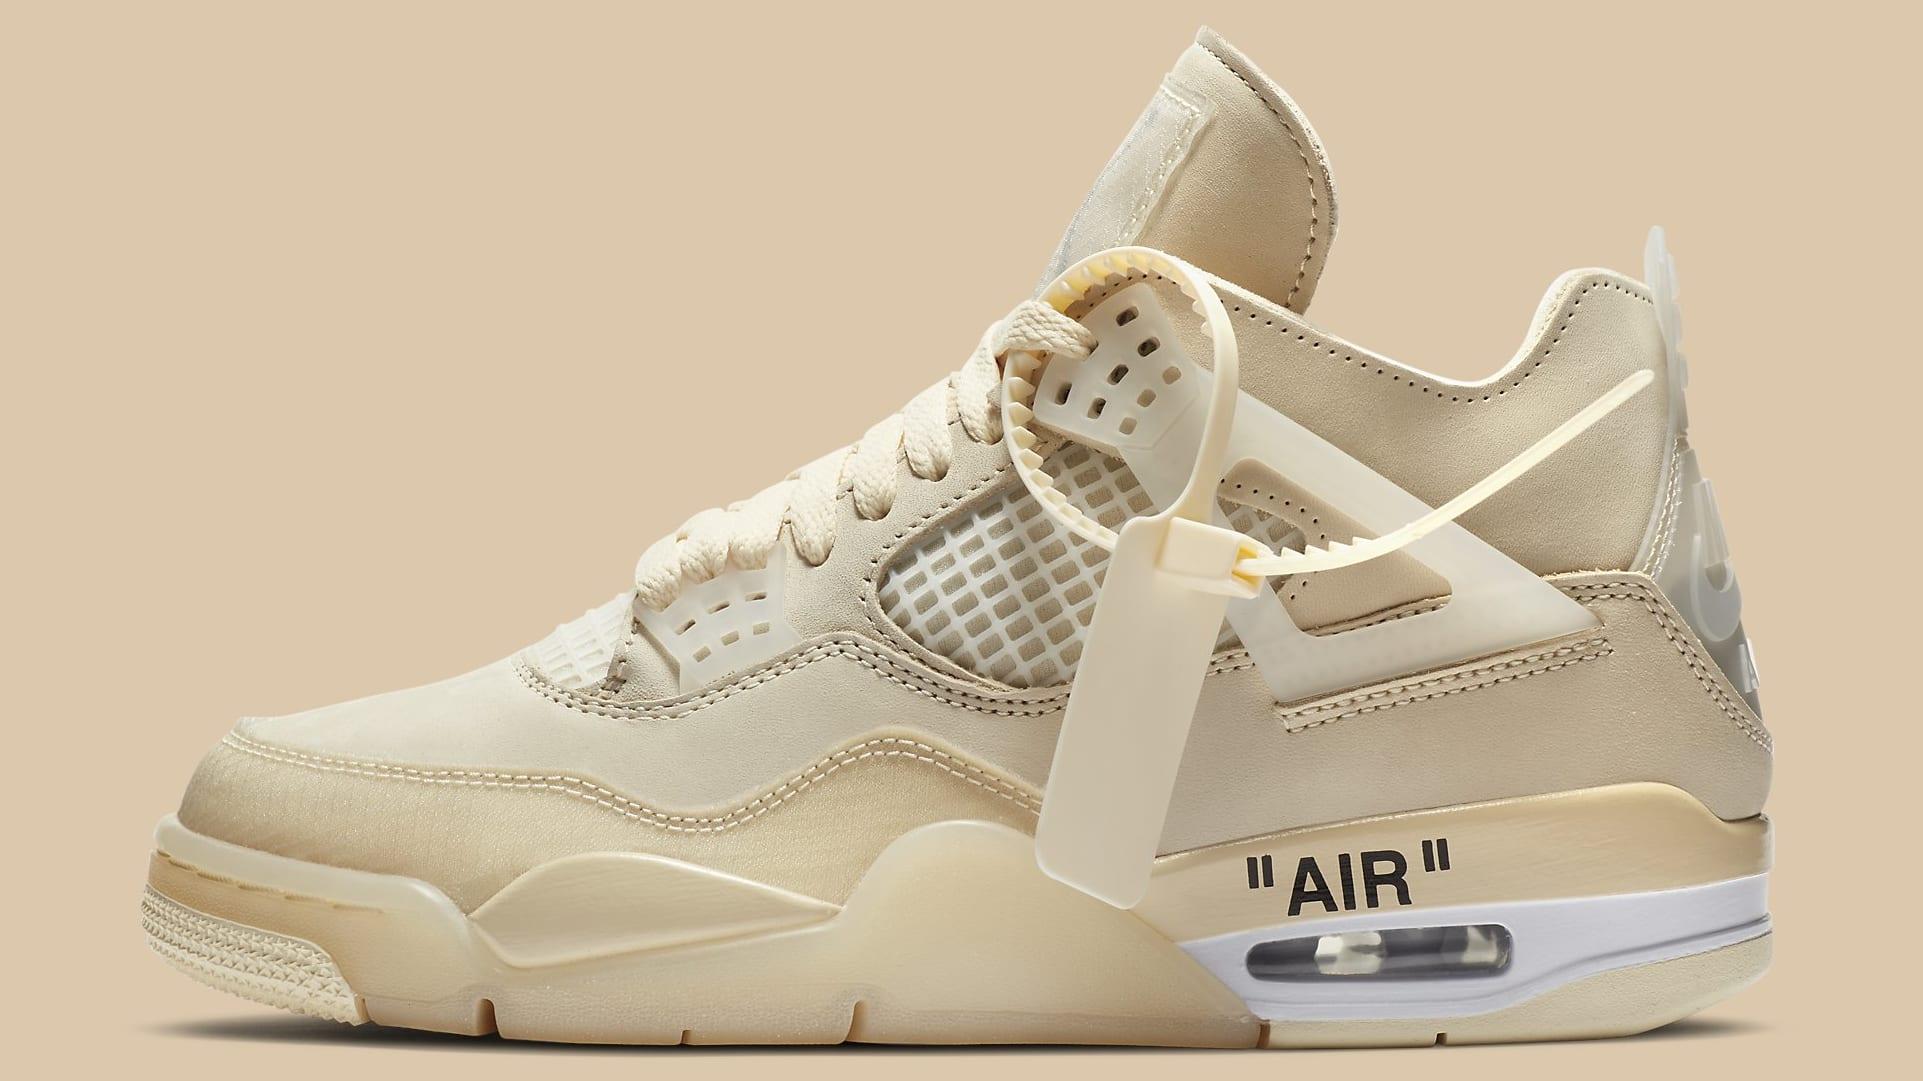 Jordan Brand Off White Jordan 4 Retro SP Sail/Muslin/White